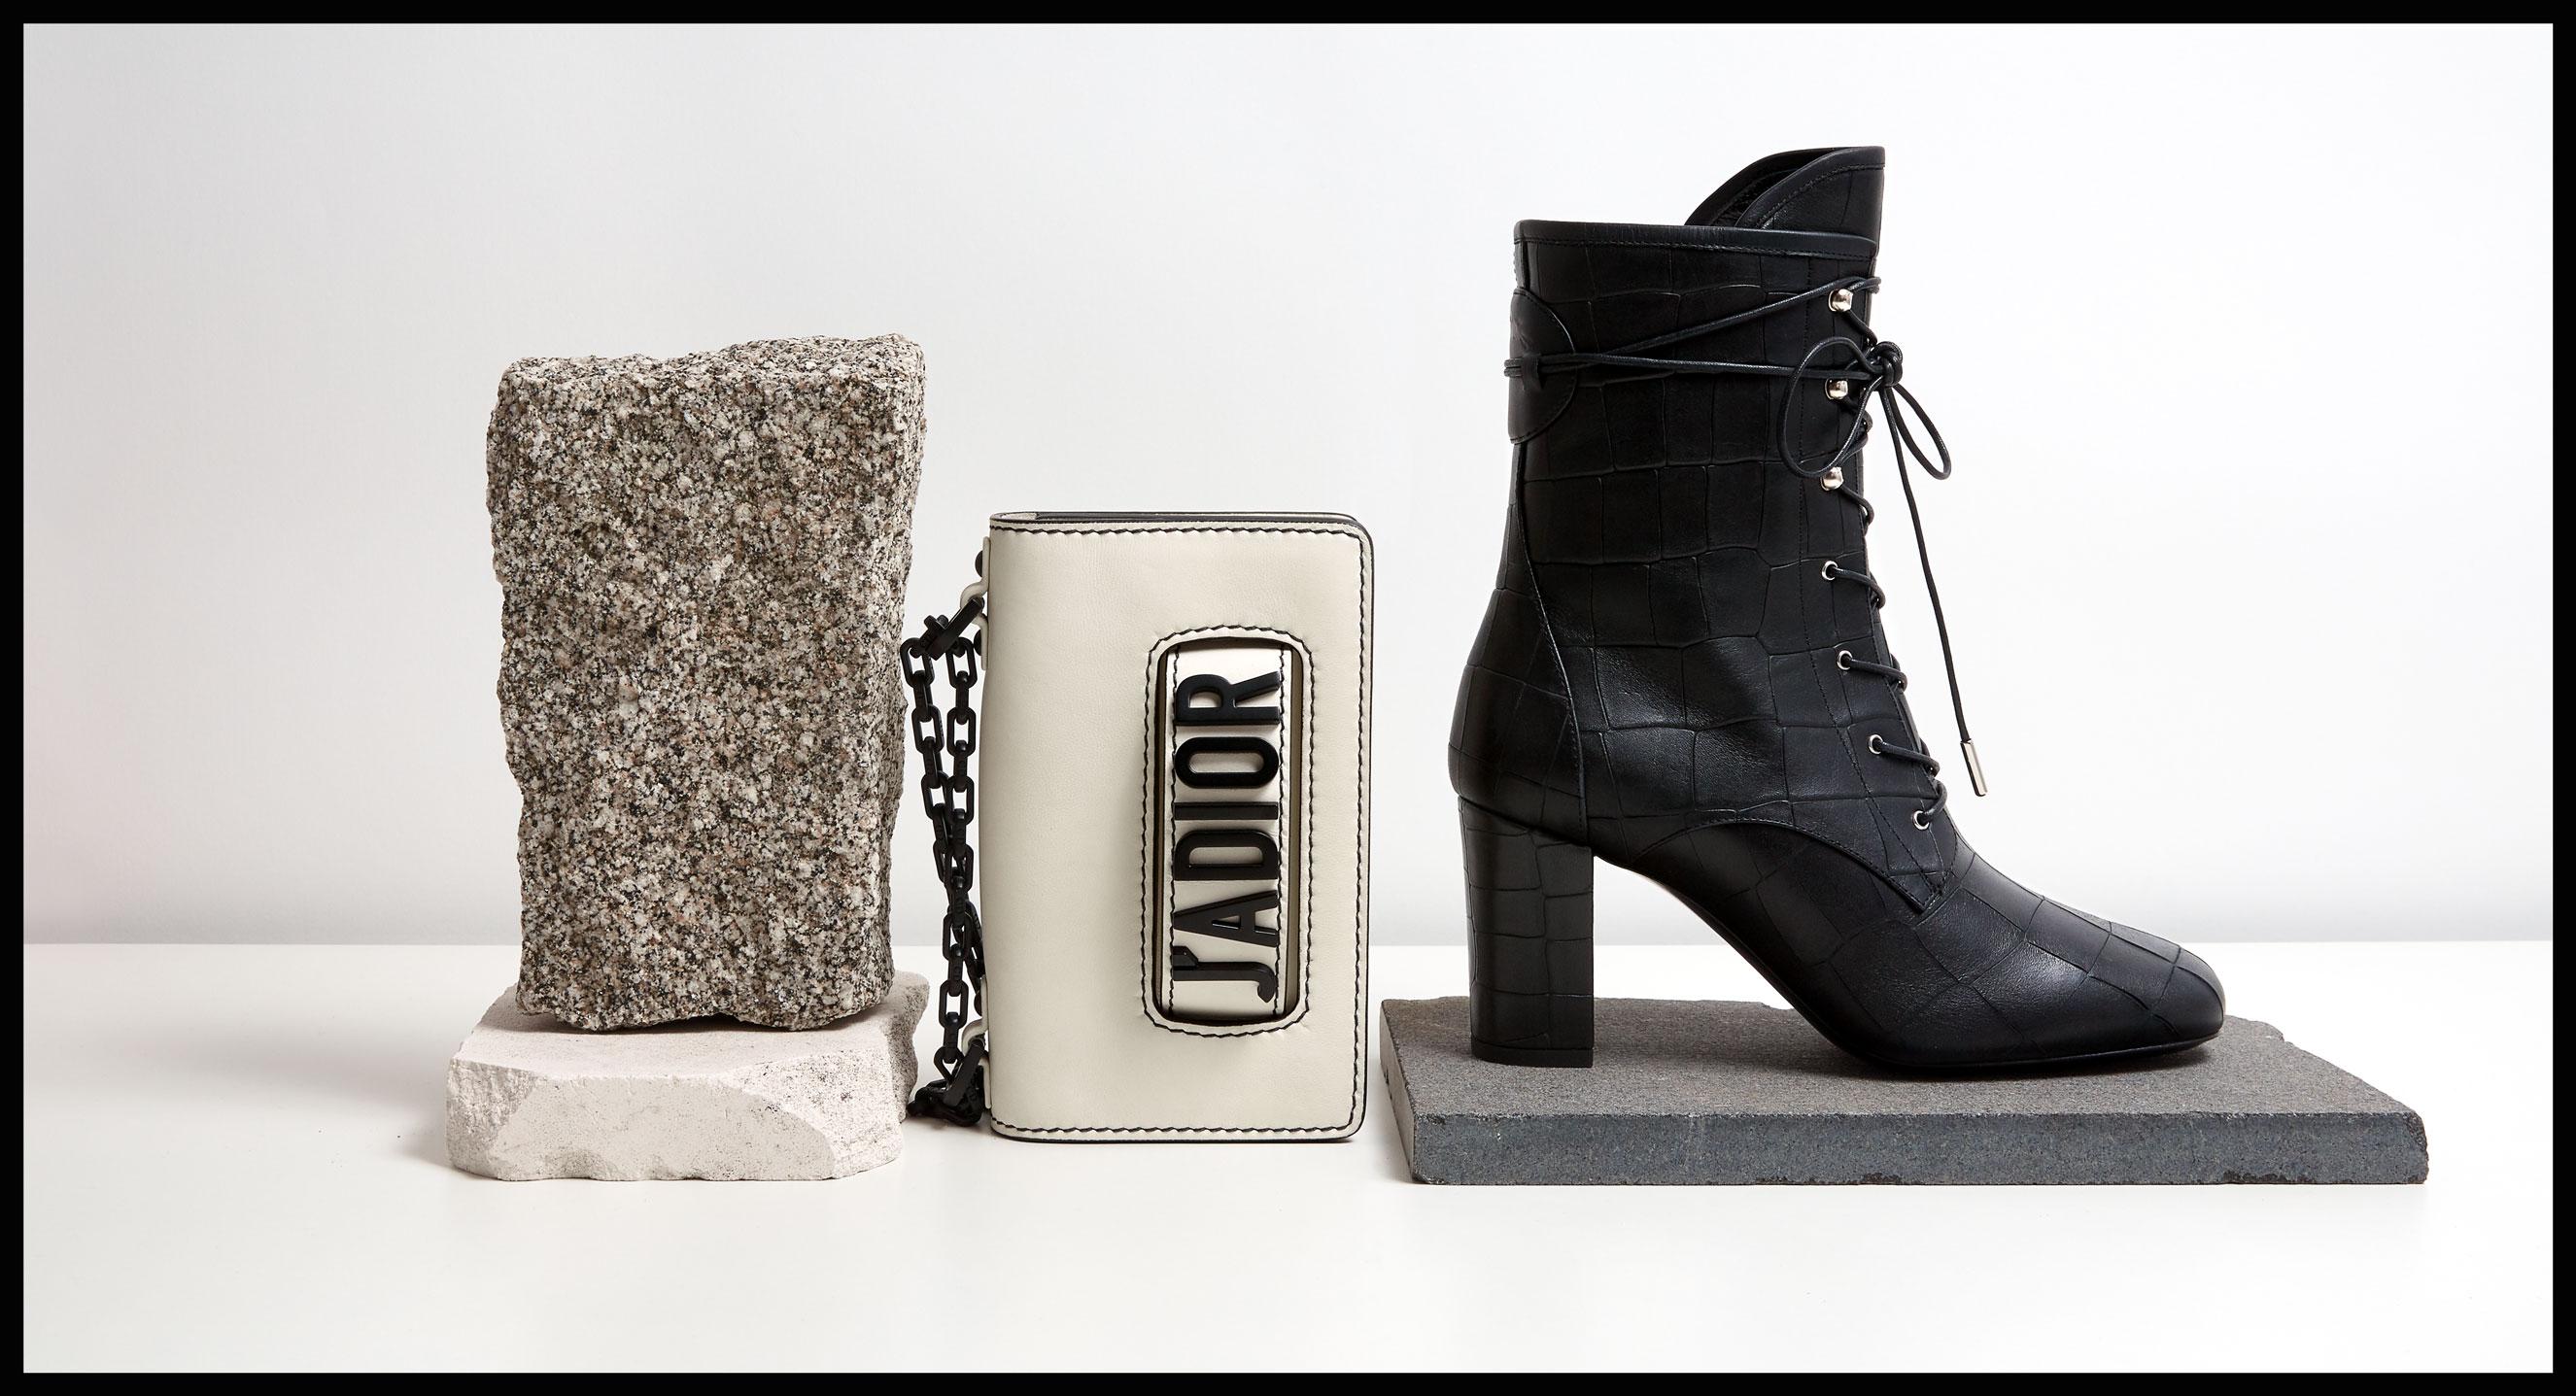 Bolso J'adior, Christian Dior. Botines de cocodrilo, Longchamp.